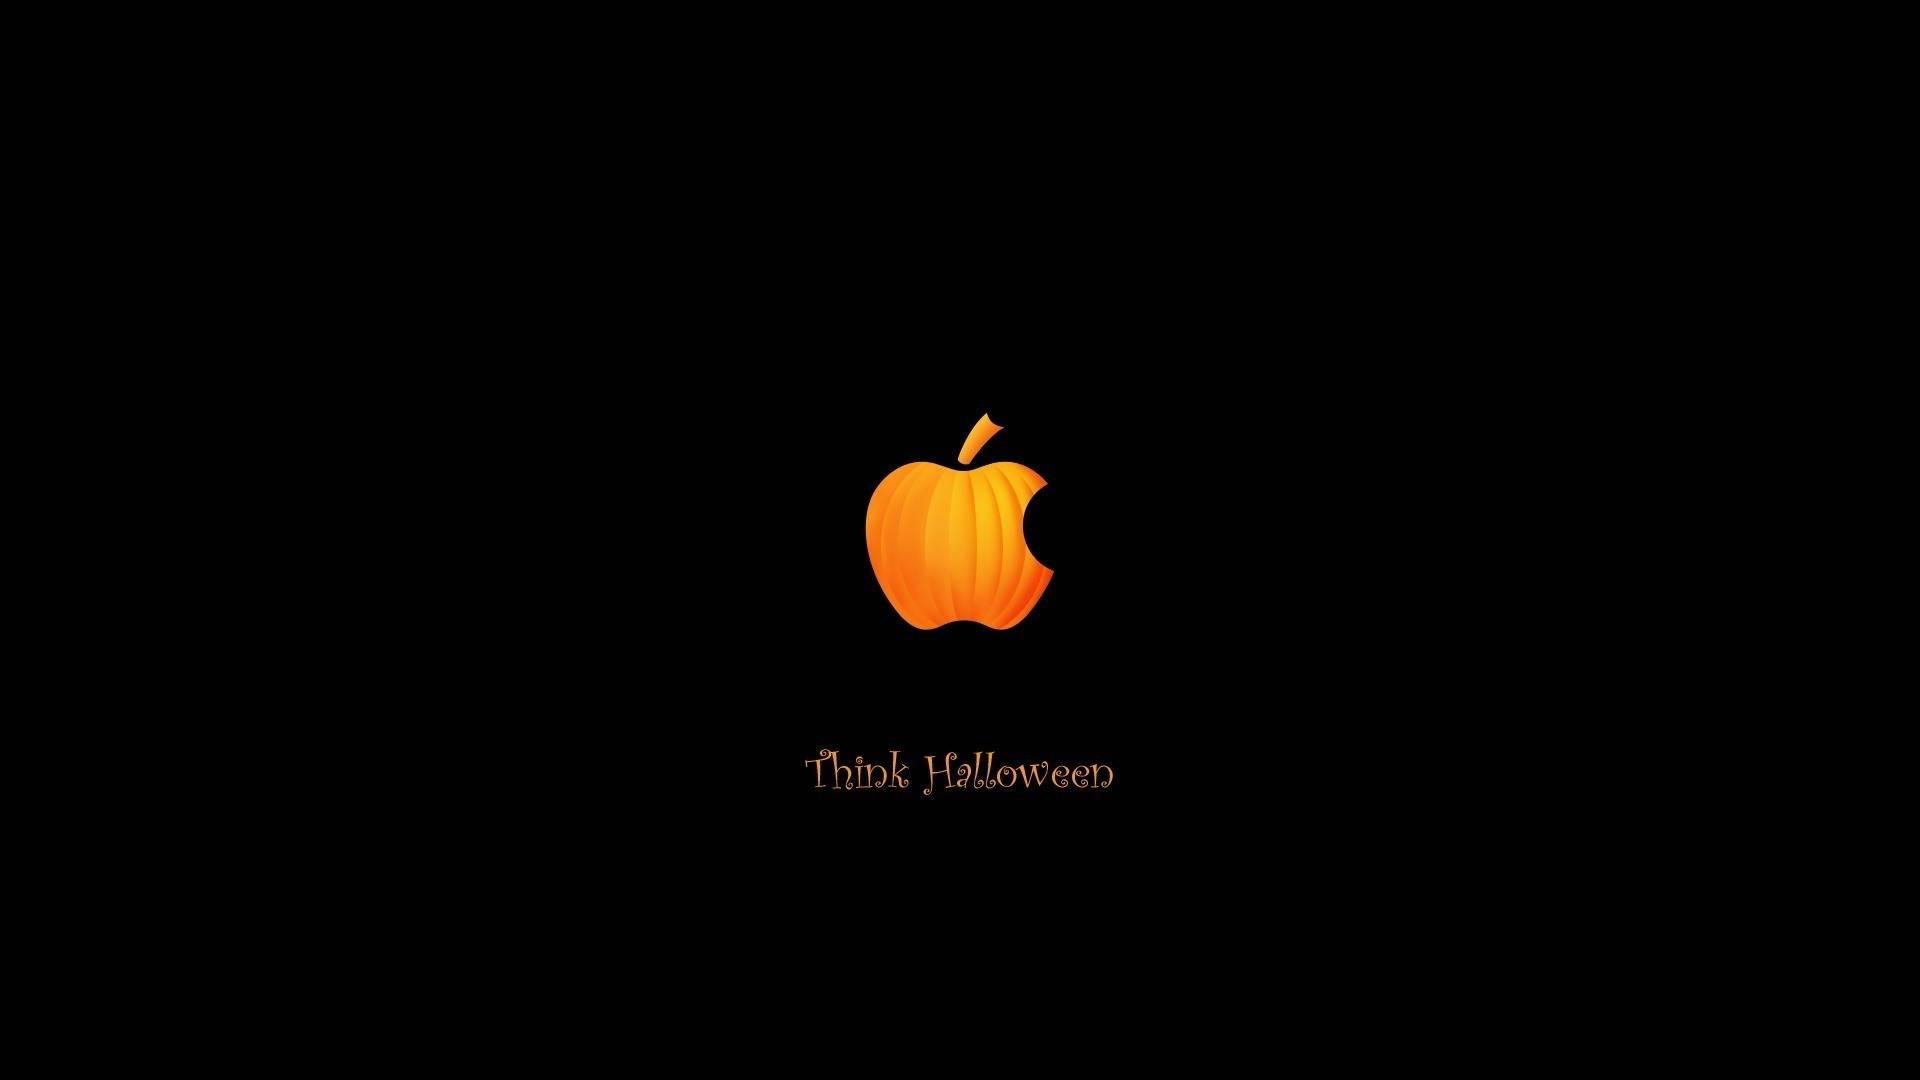 apple logo   Apple Wallpaper 1920x1080